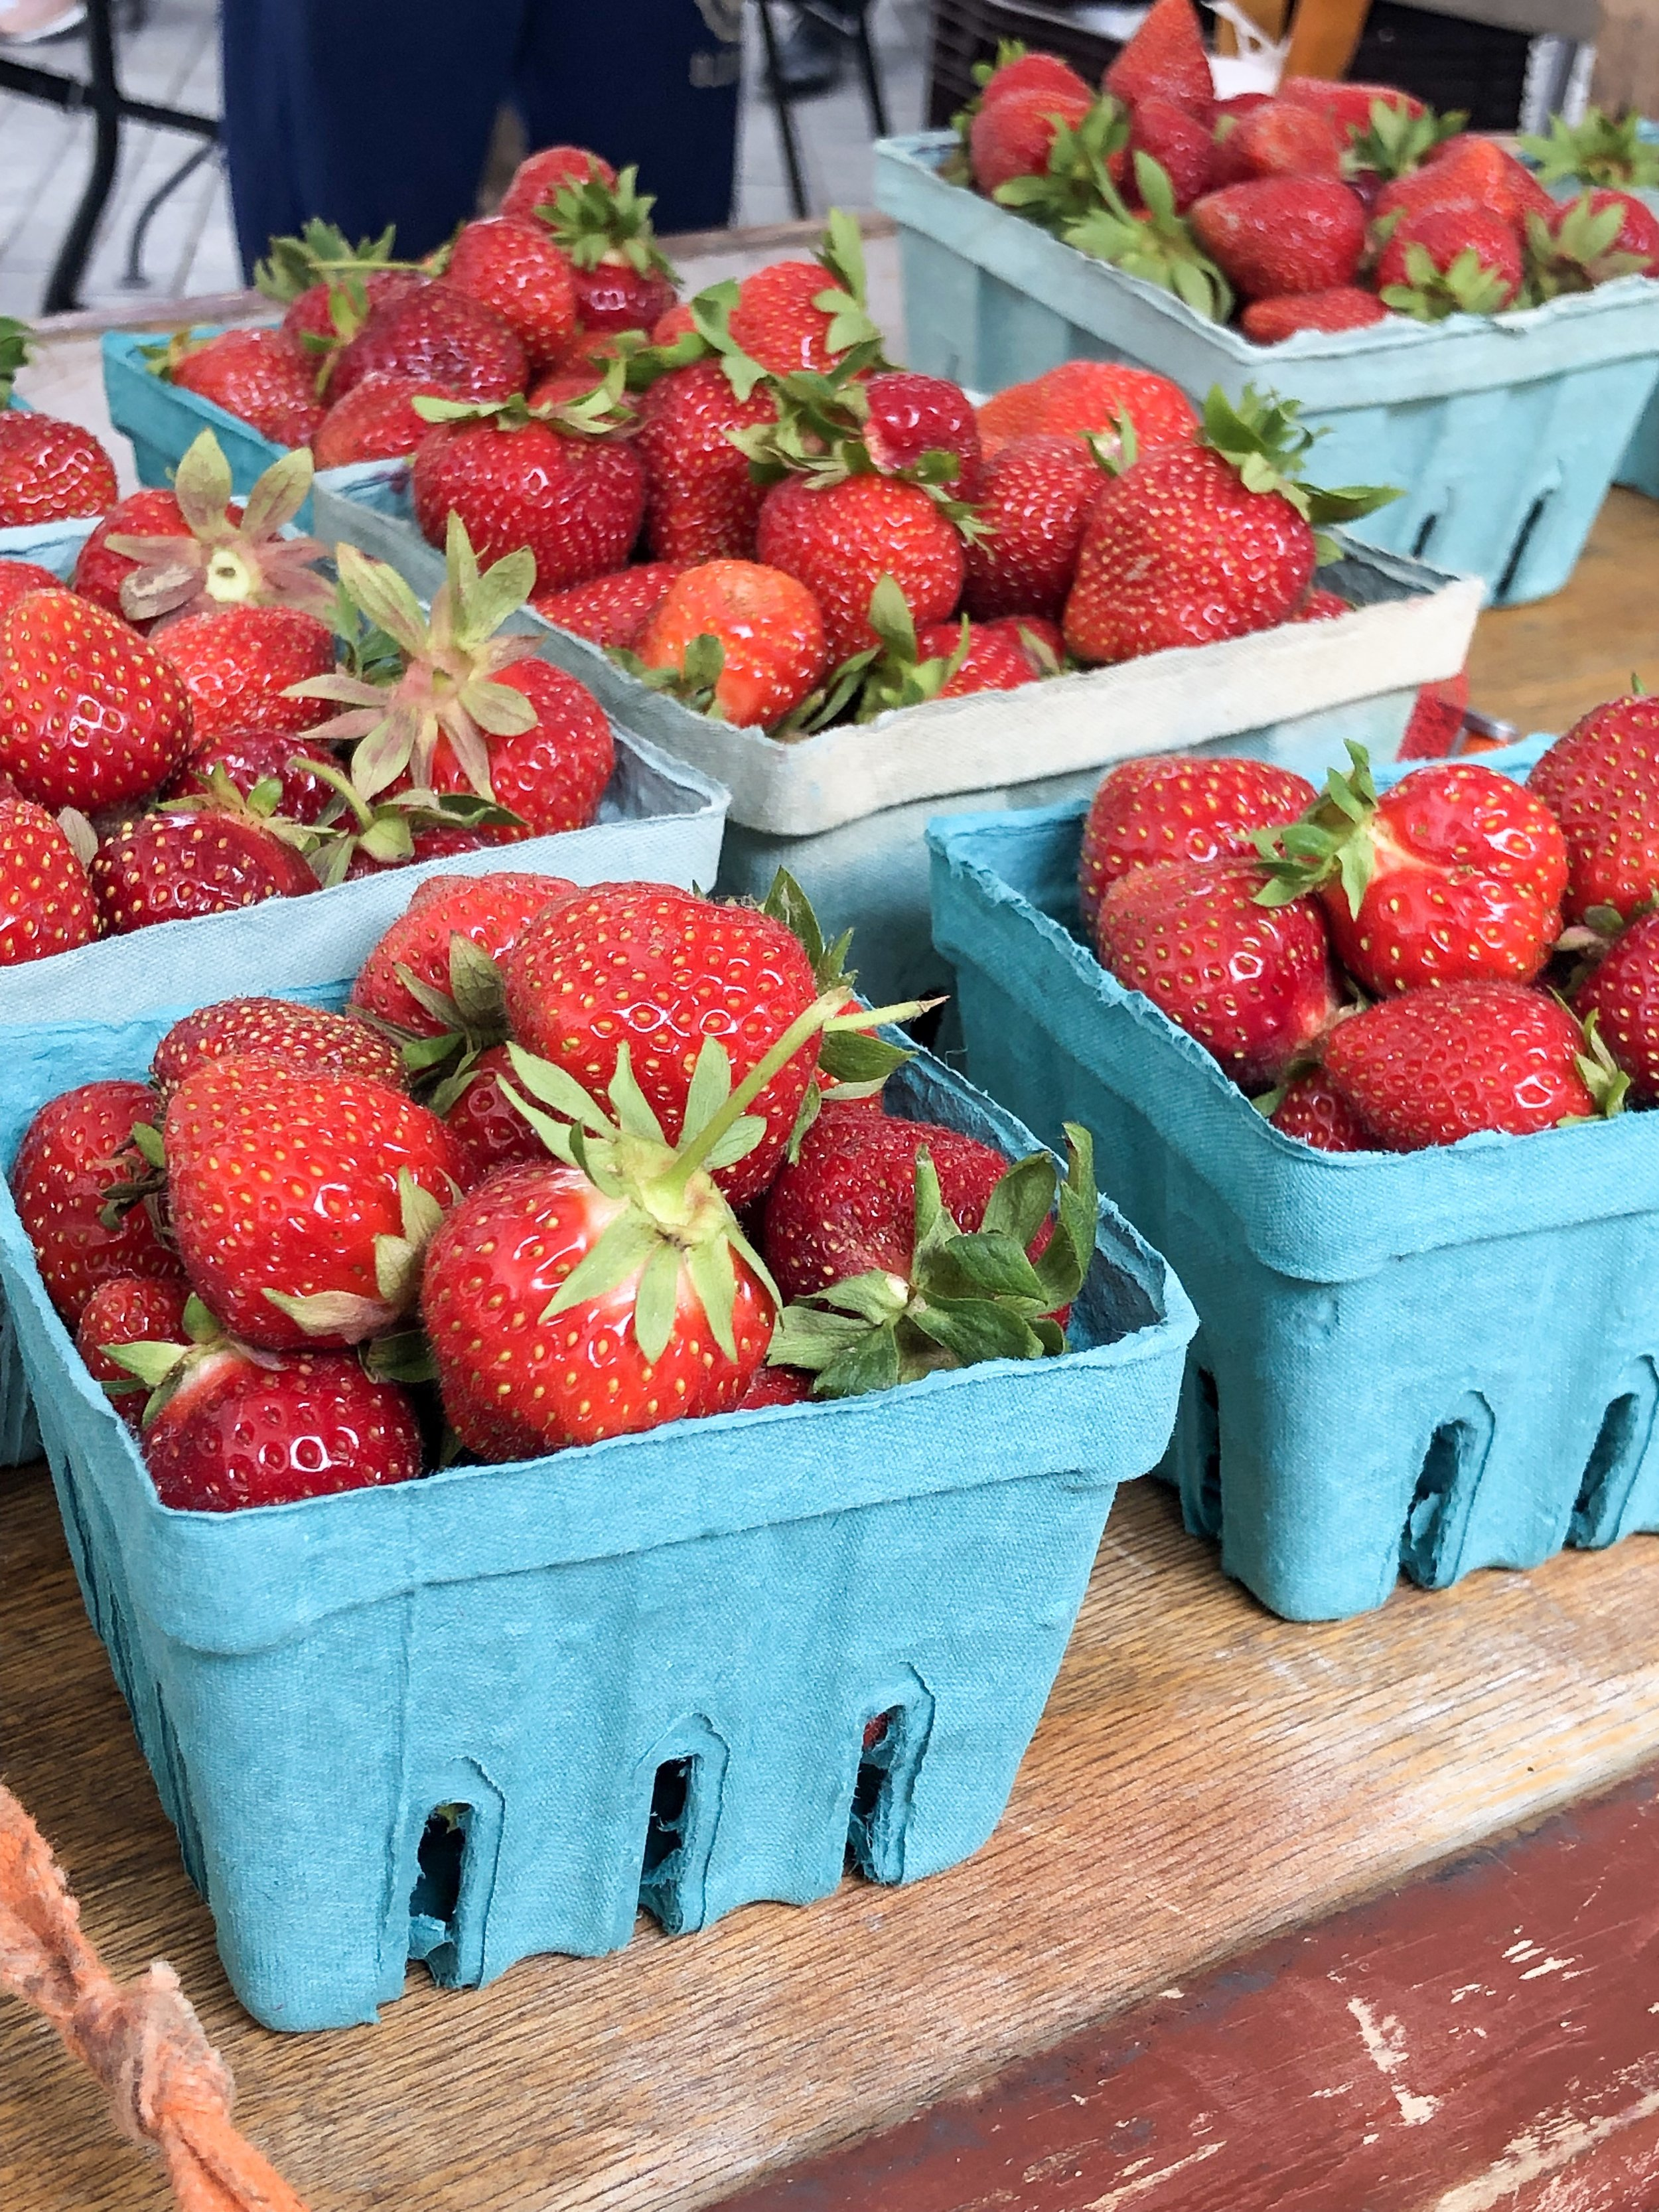 Farmers Market Strawberries 3.jpg